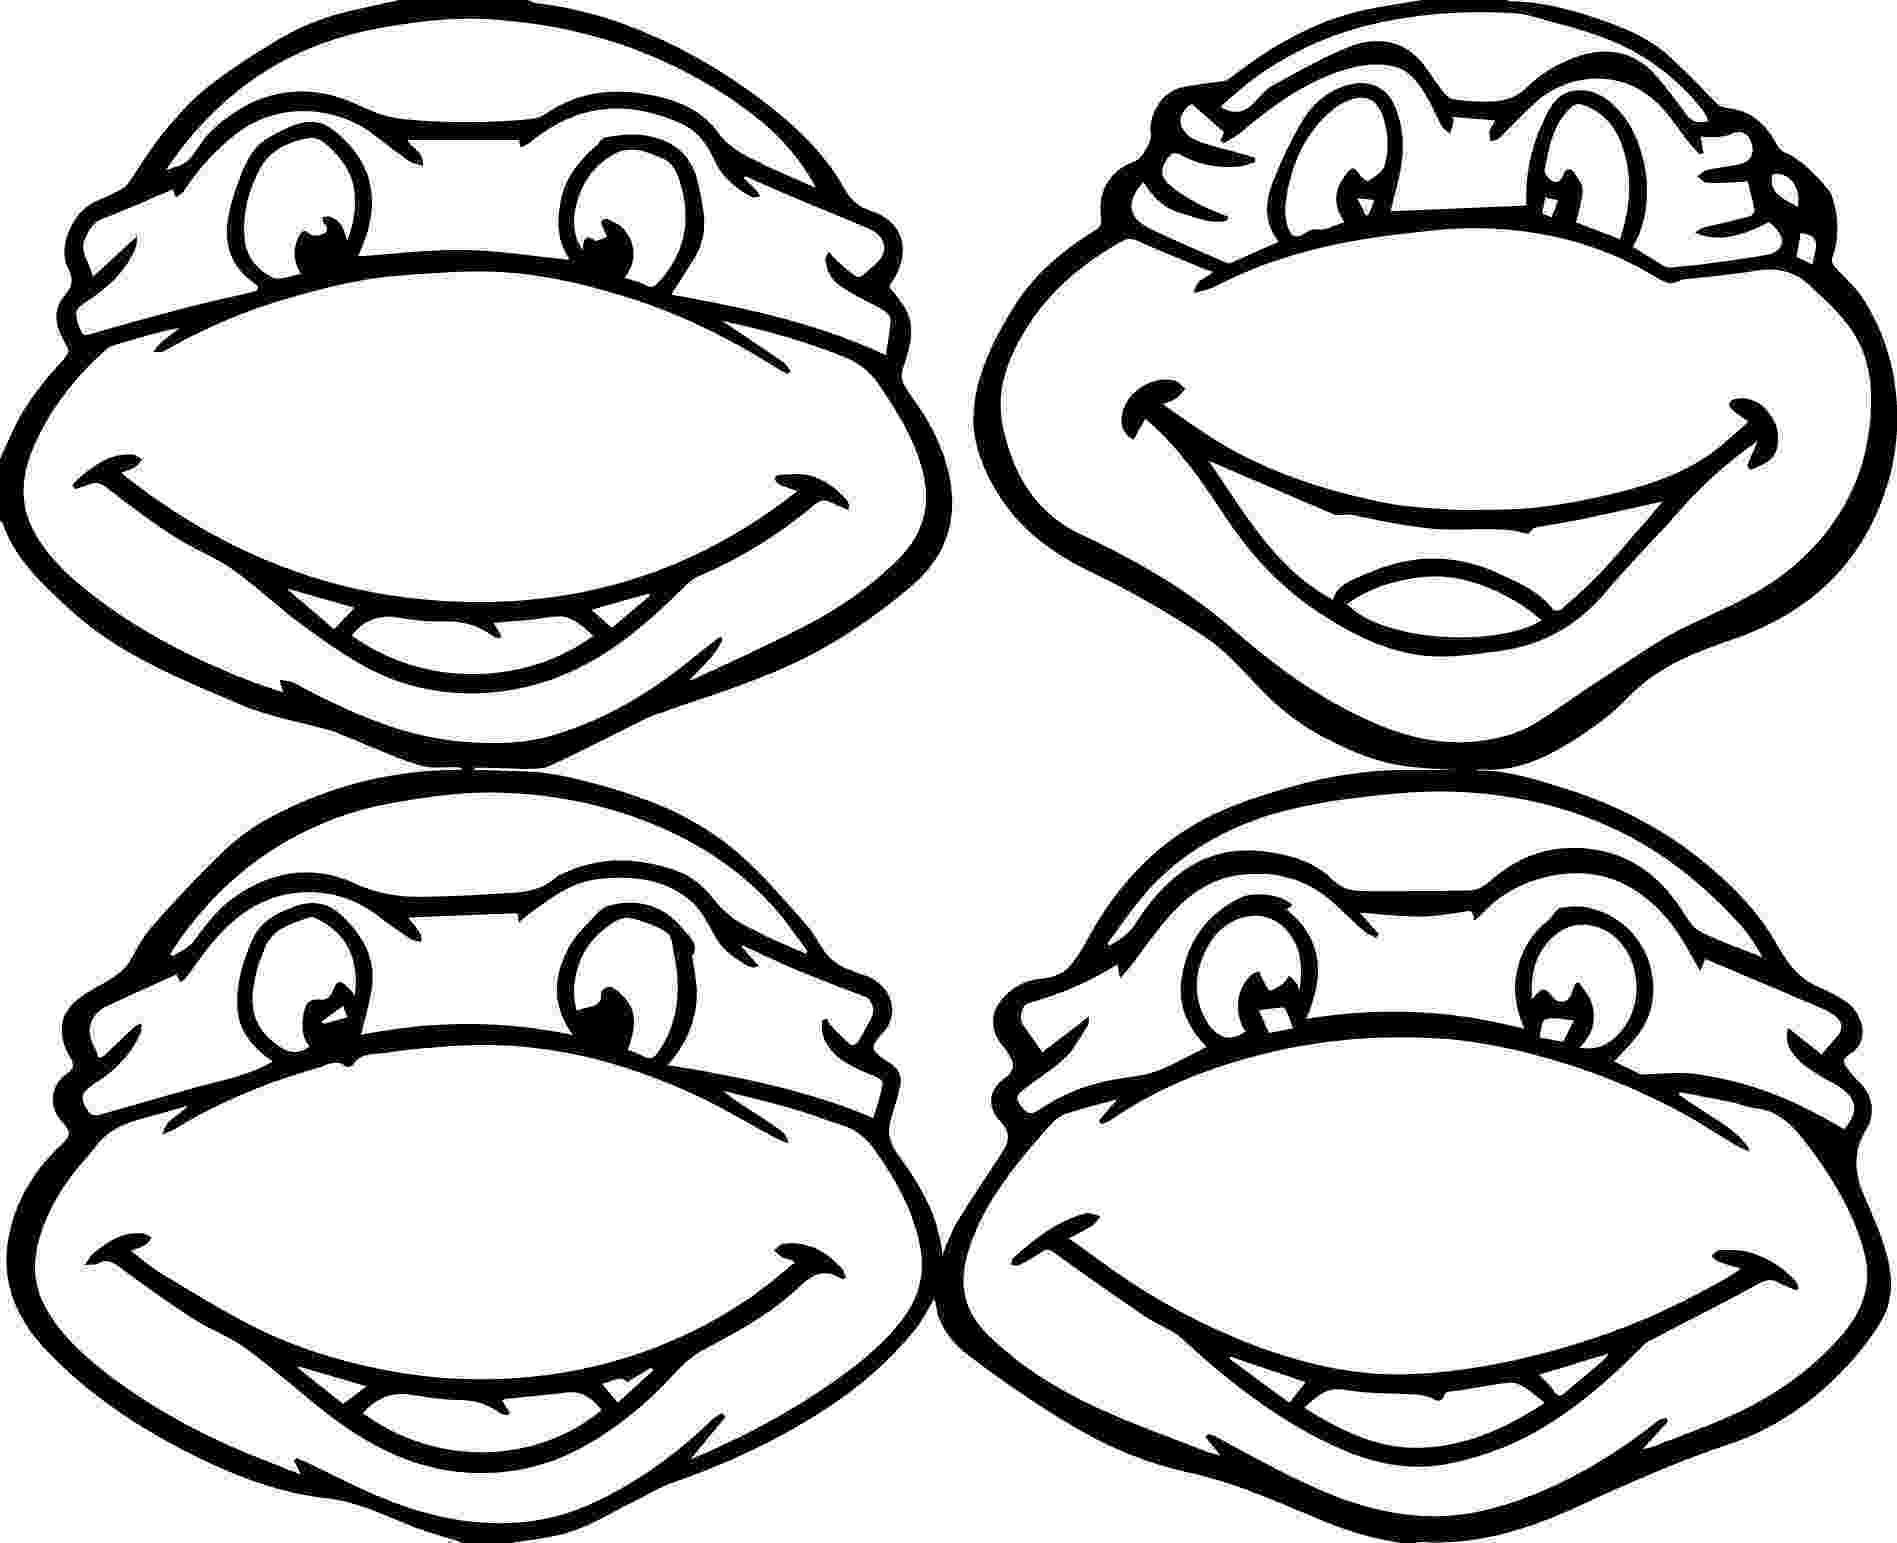 ninja turtle coloring sheets craftoholic teenage mutant ninja turtles coloring pages turtle sheets ninja coloring